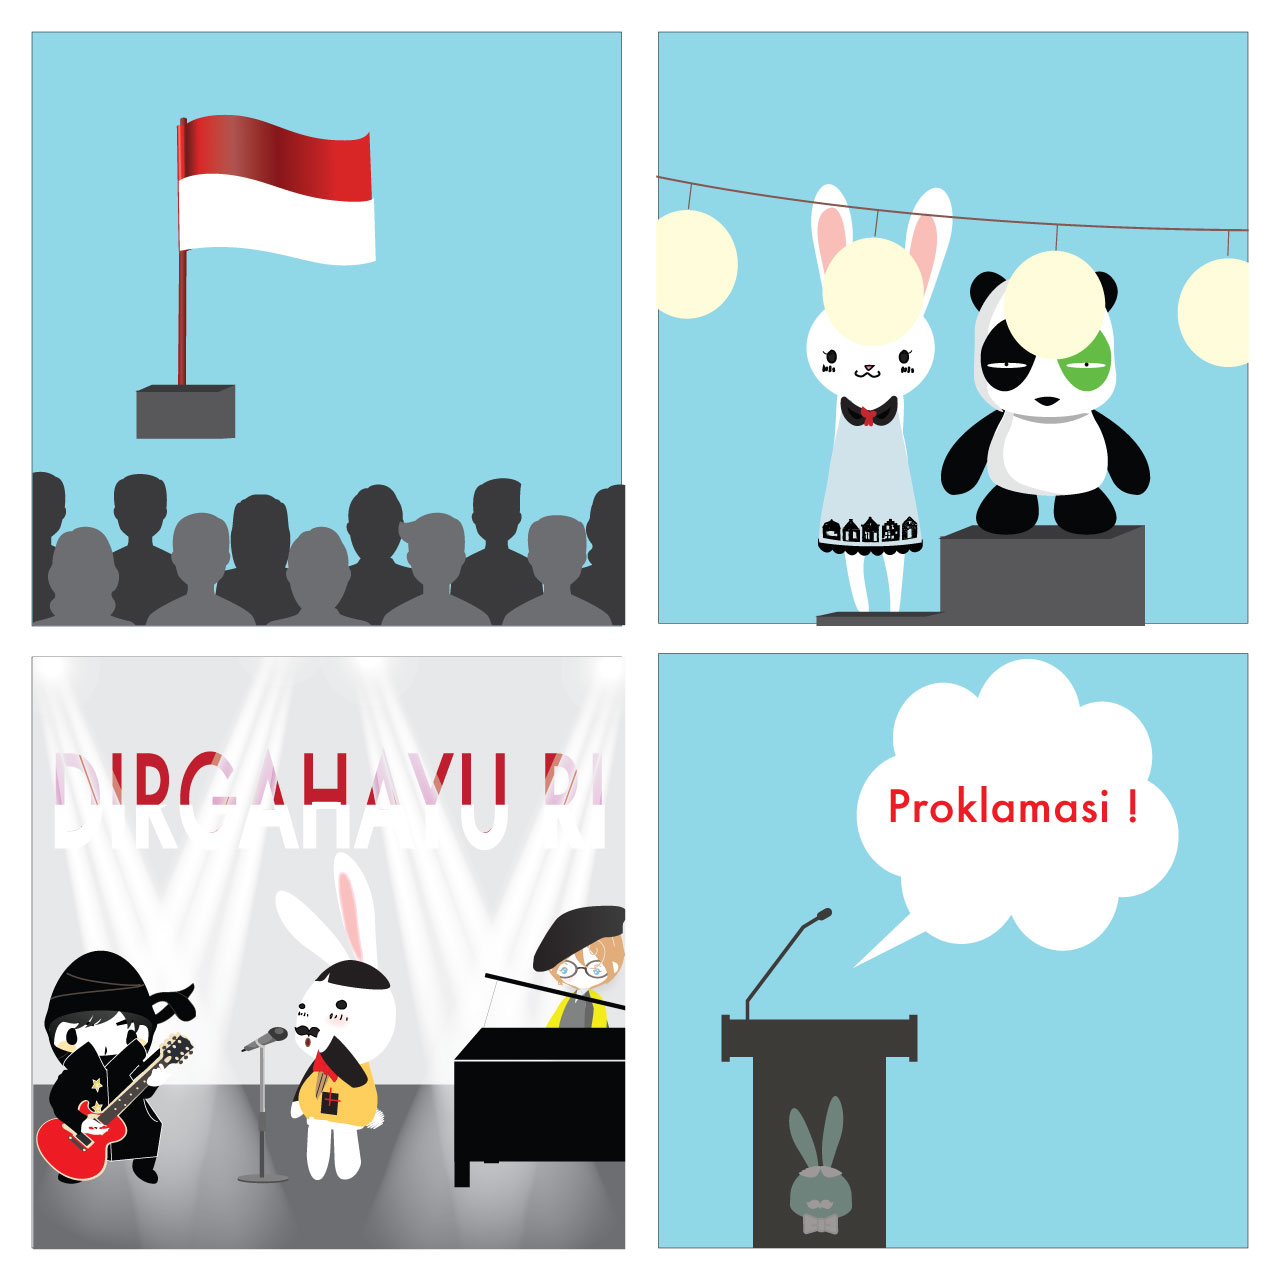 dirgahayu-indonesia